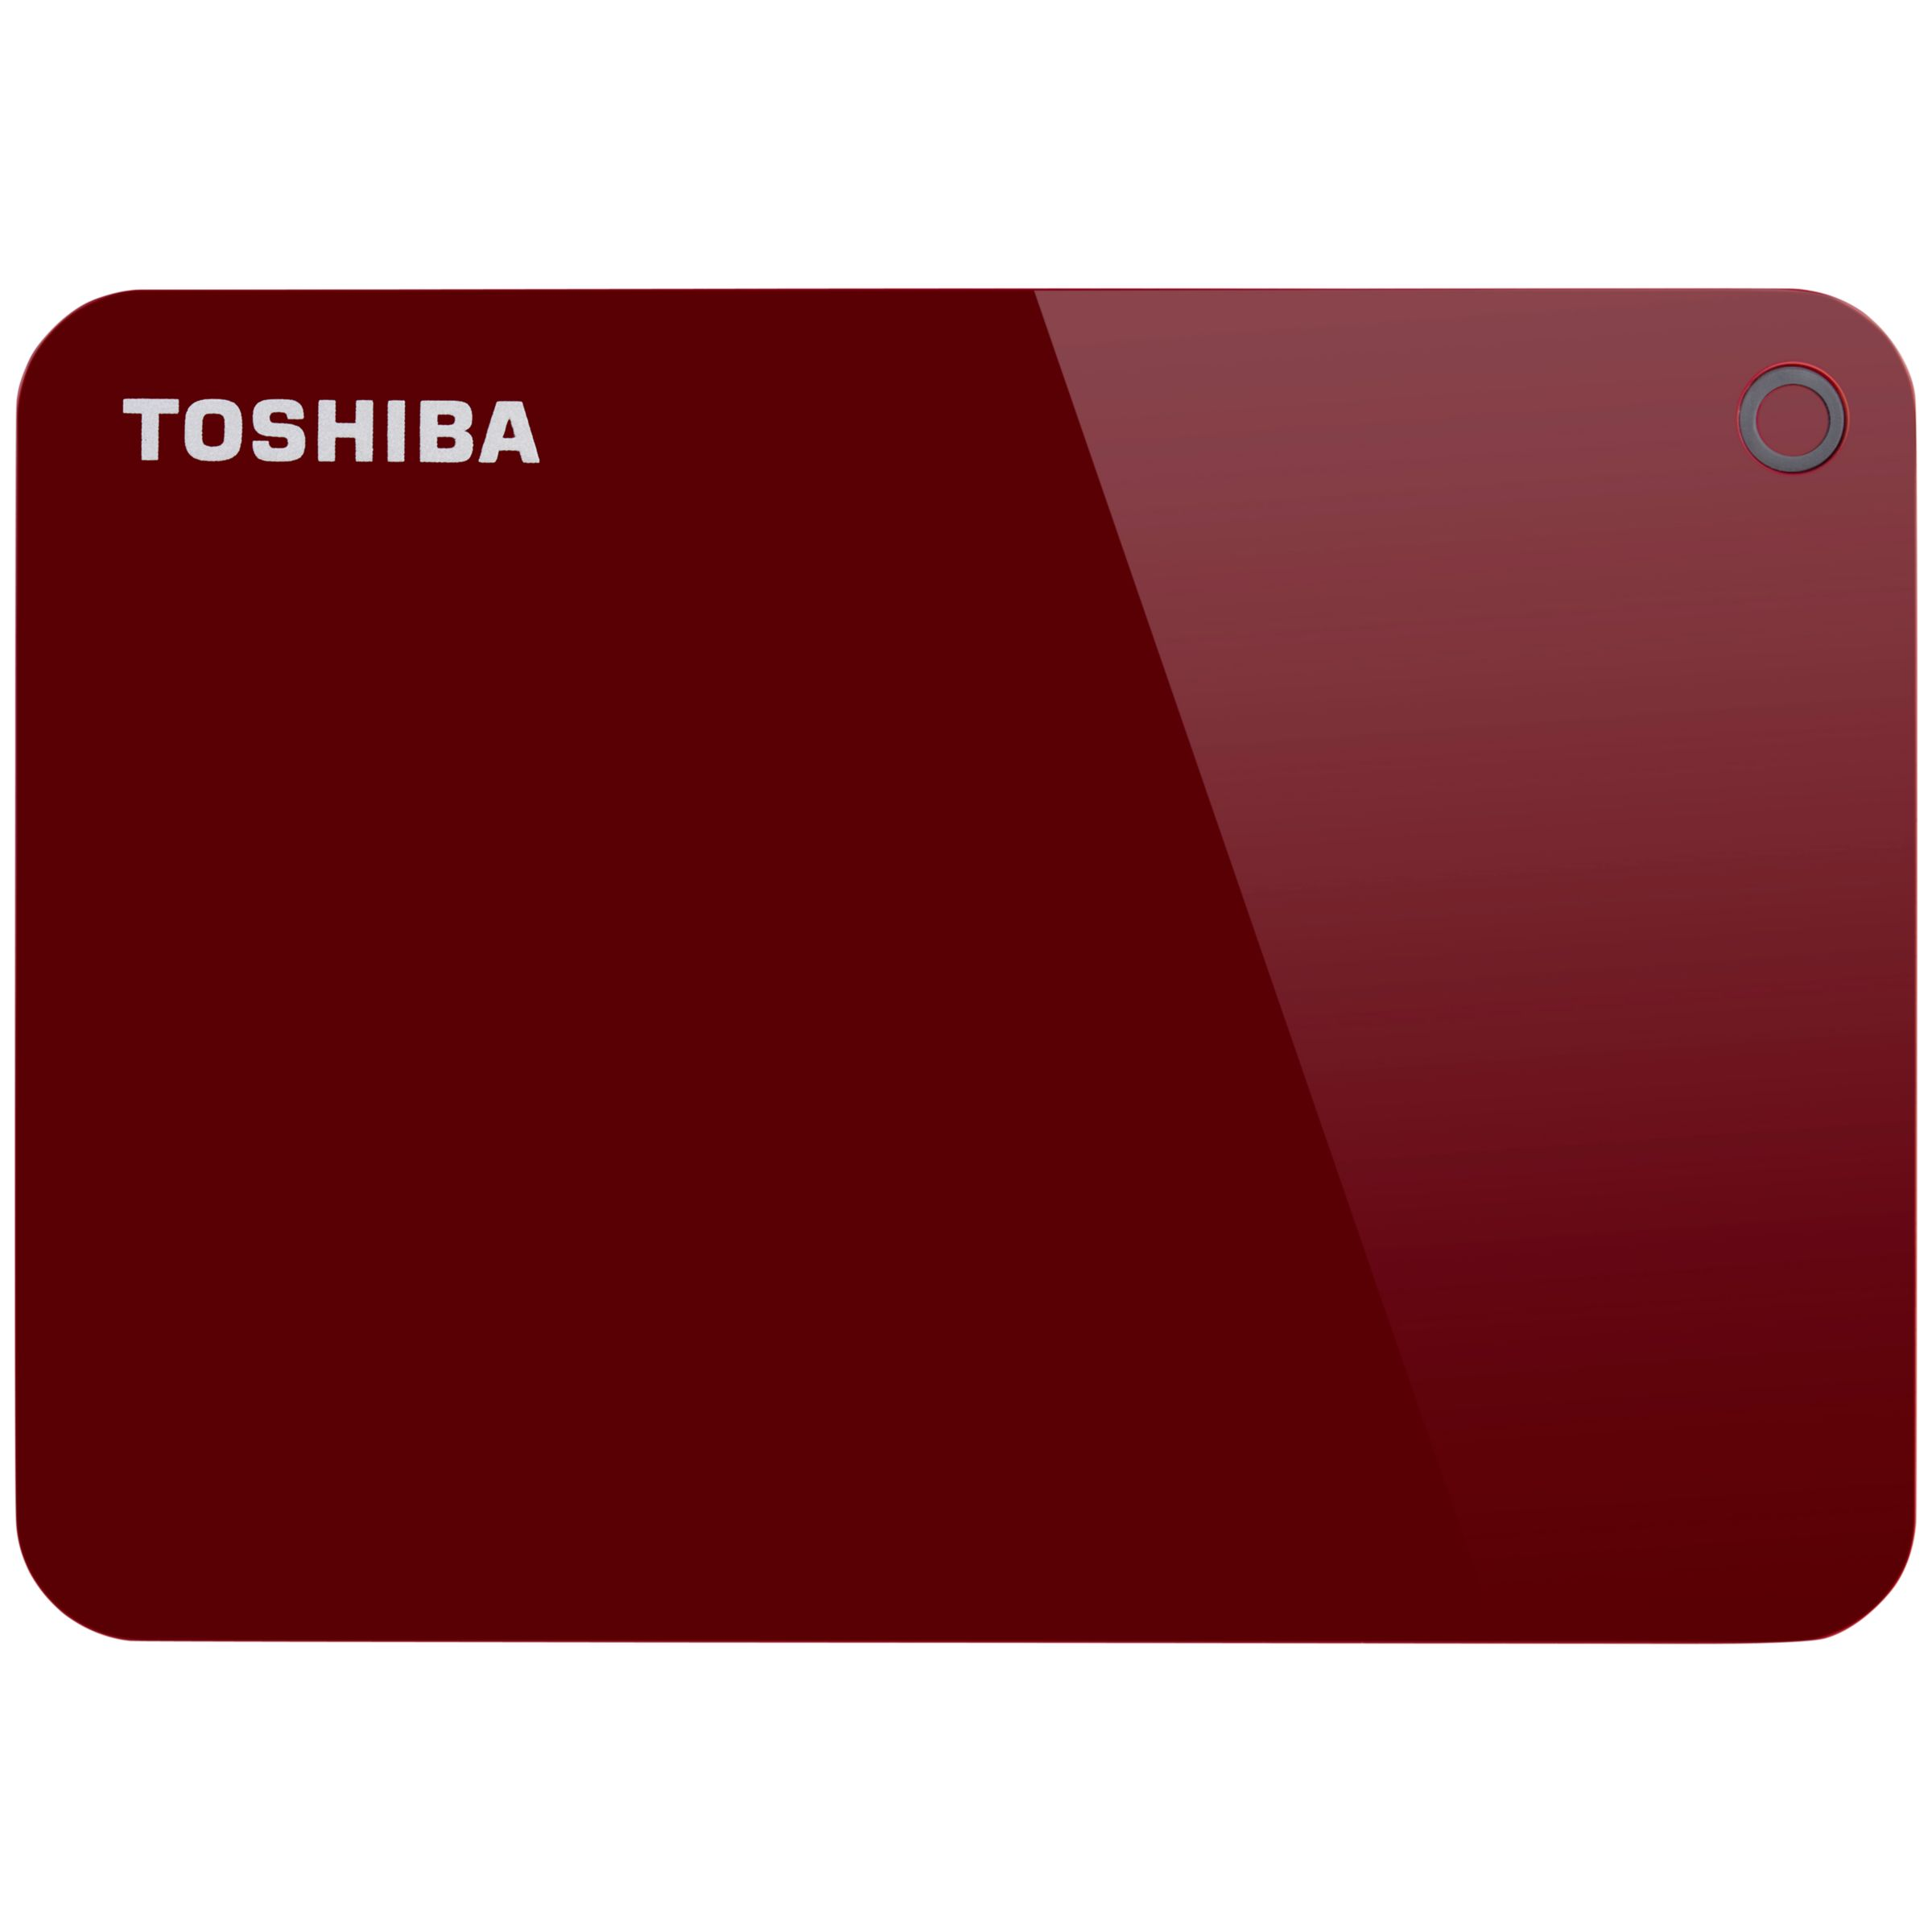 Toshiba Toshiba Canvio Advance, Portable Hard Drive, USB 3.0, 1TB